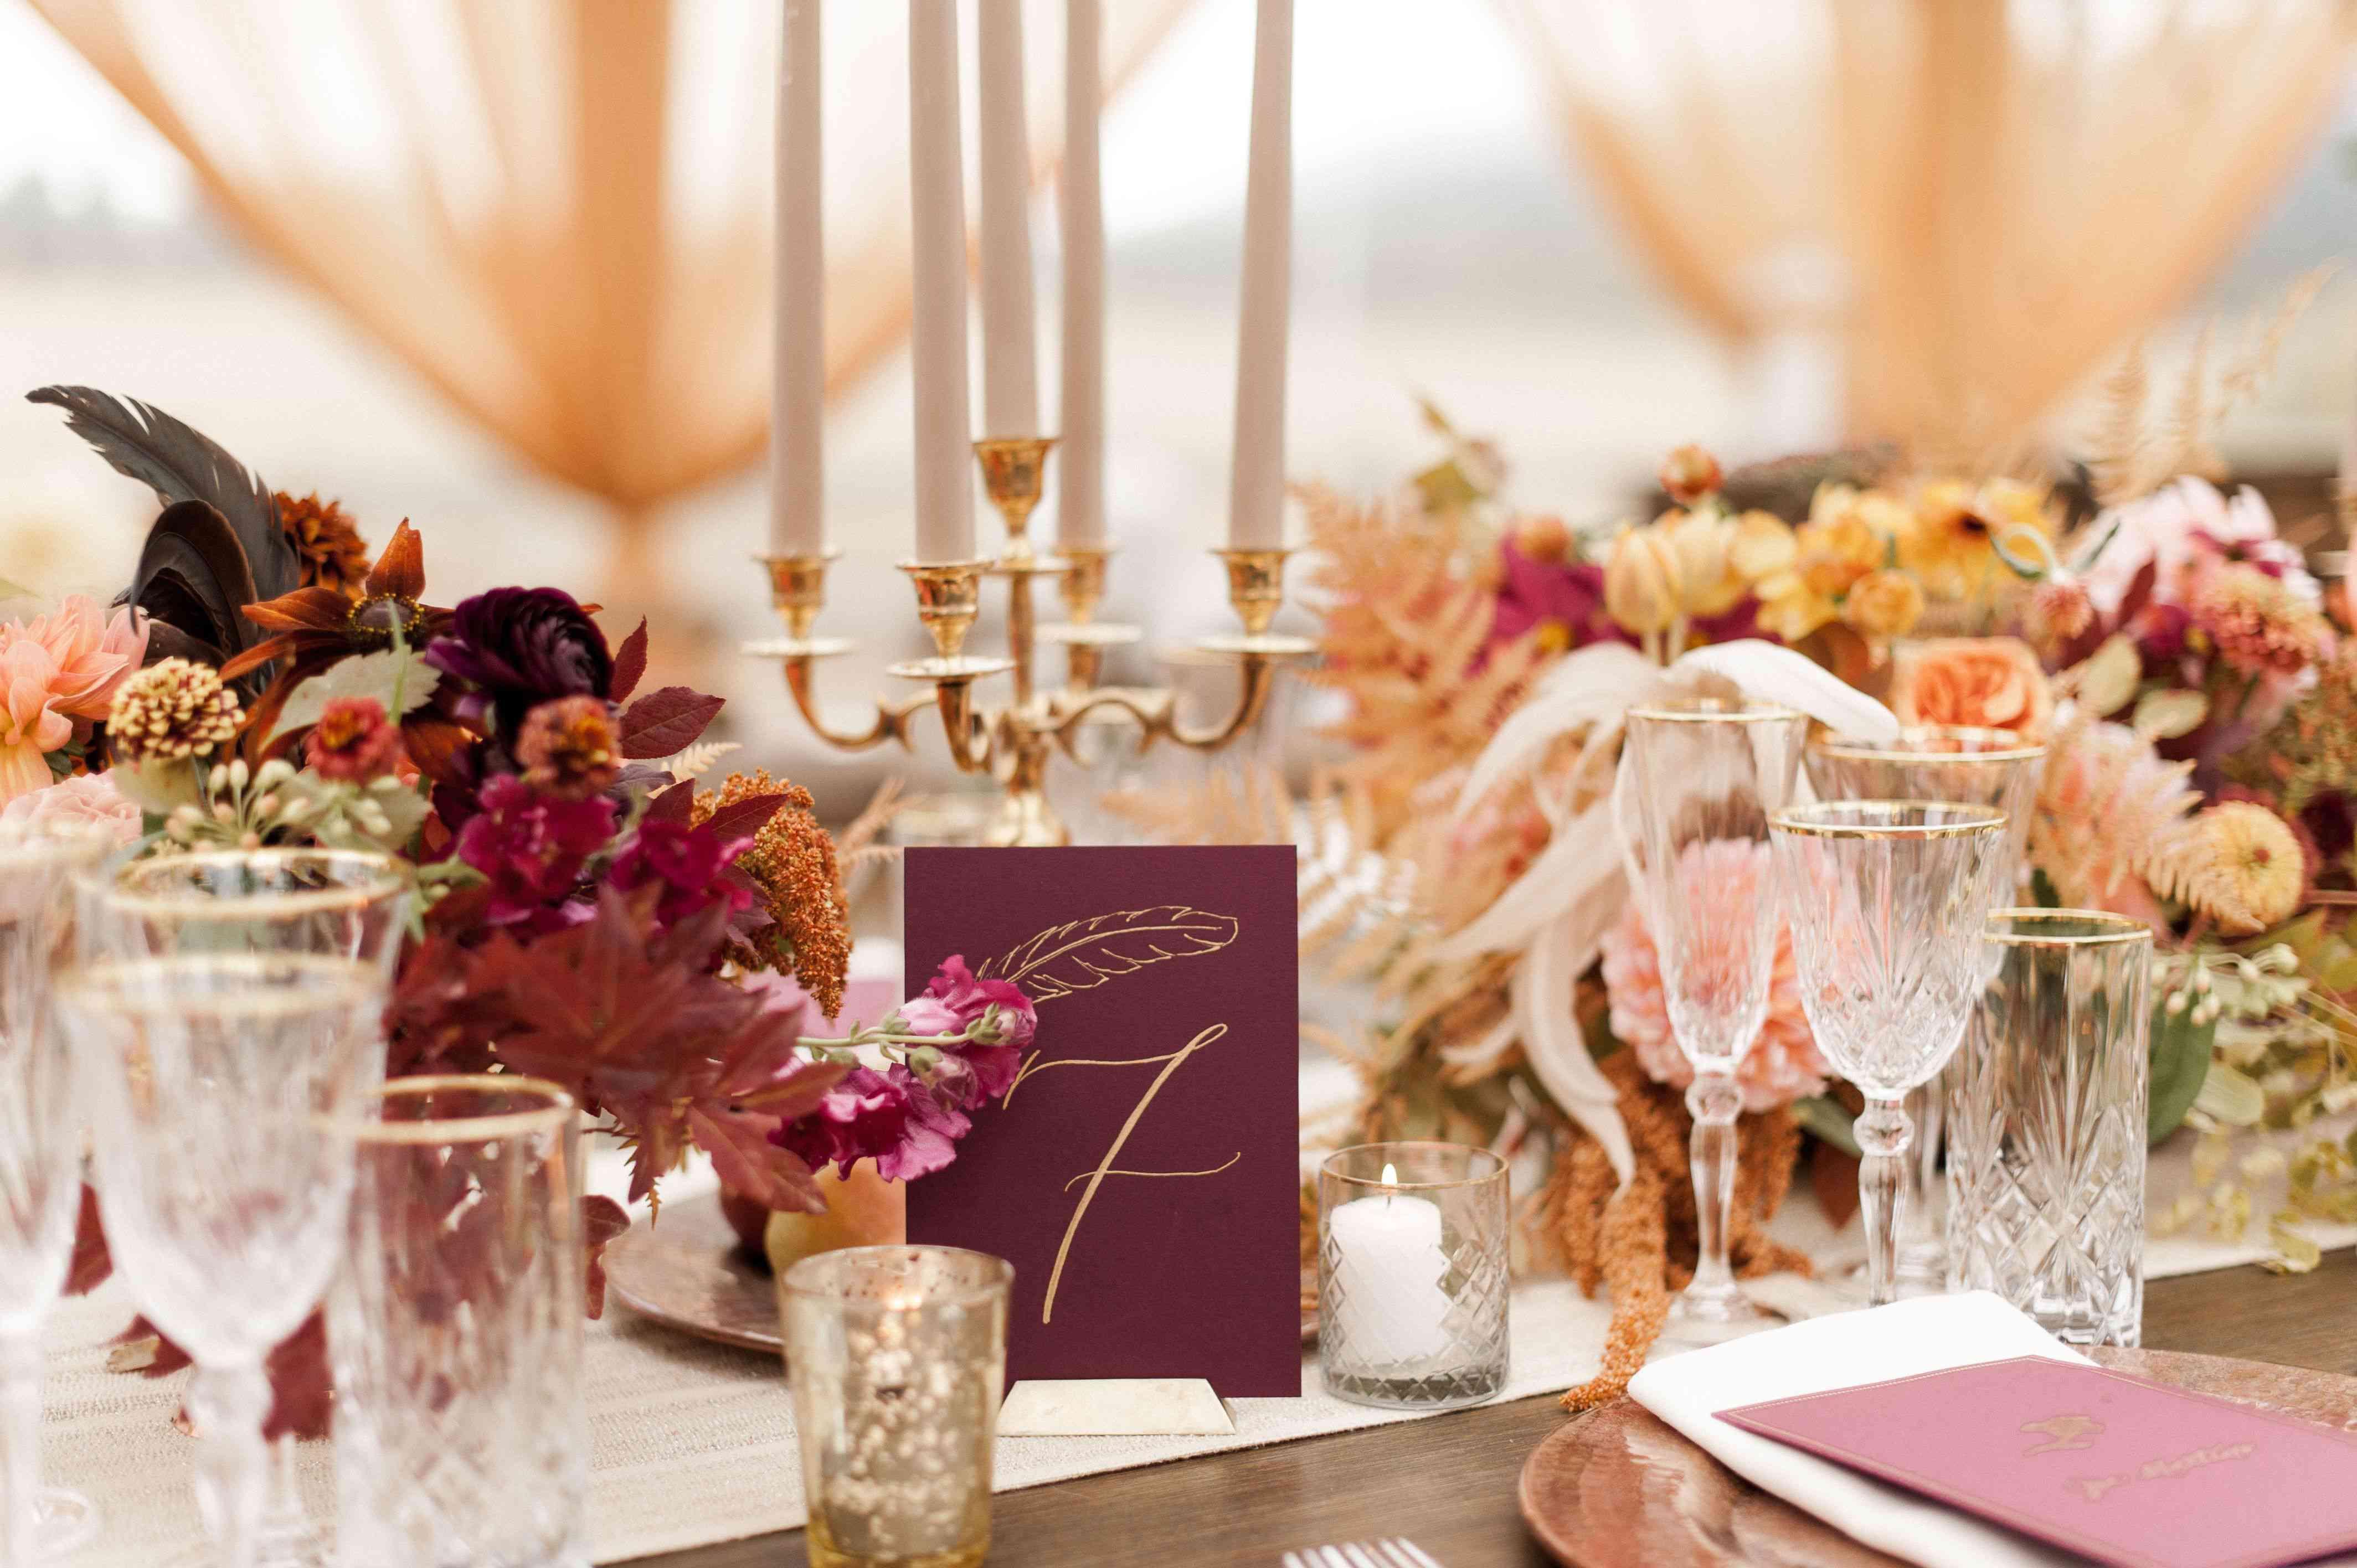 Burgundy table setting